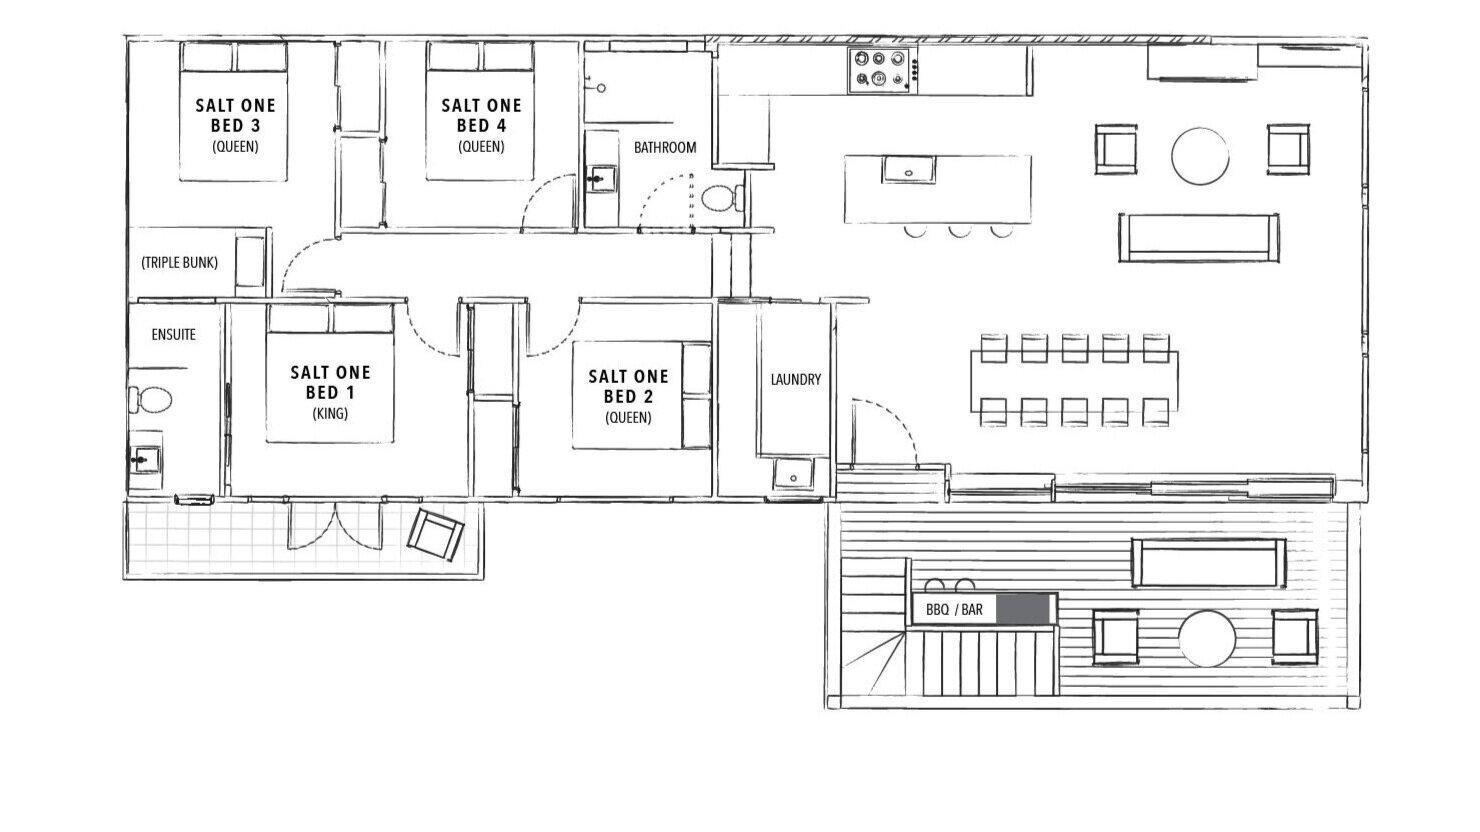 SaltOne-Floorplan.jpg